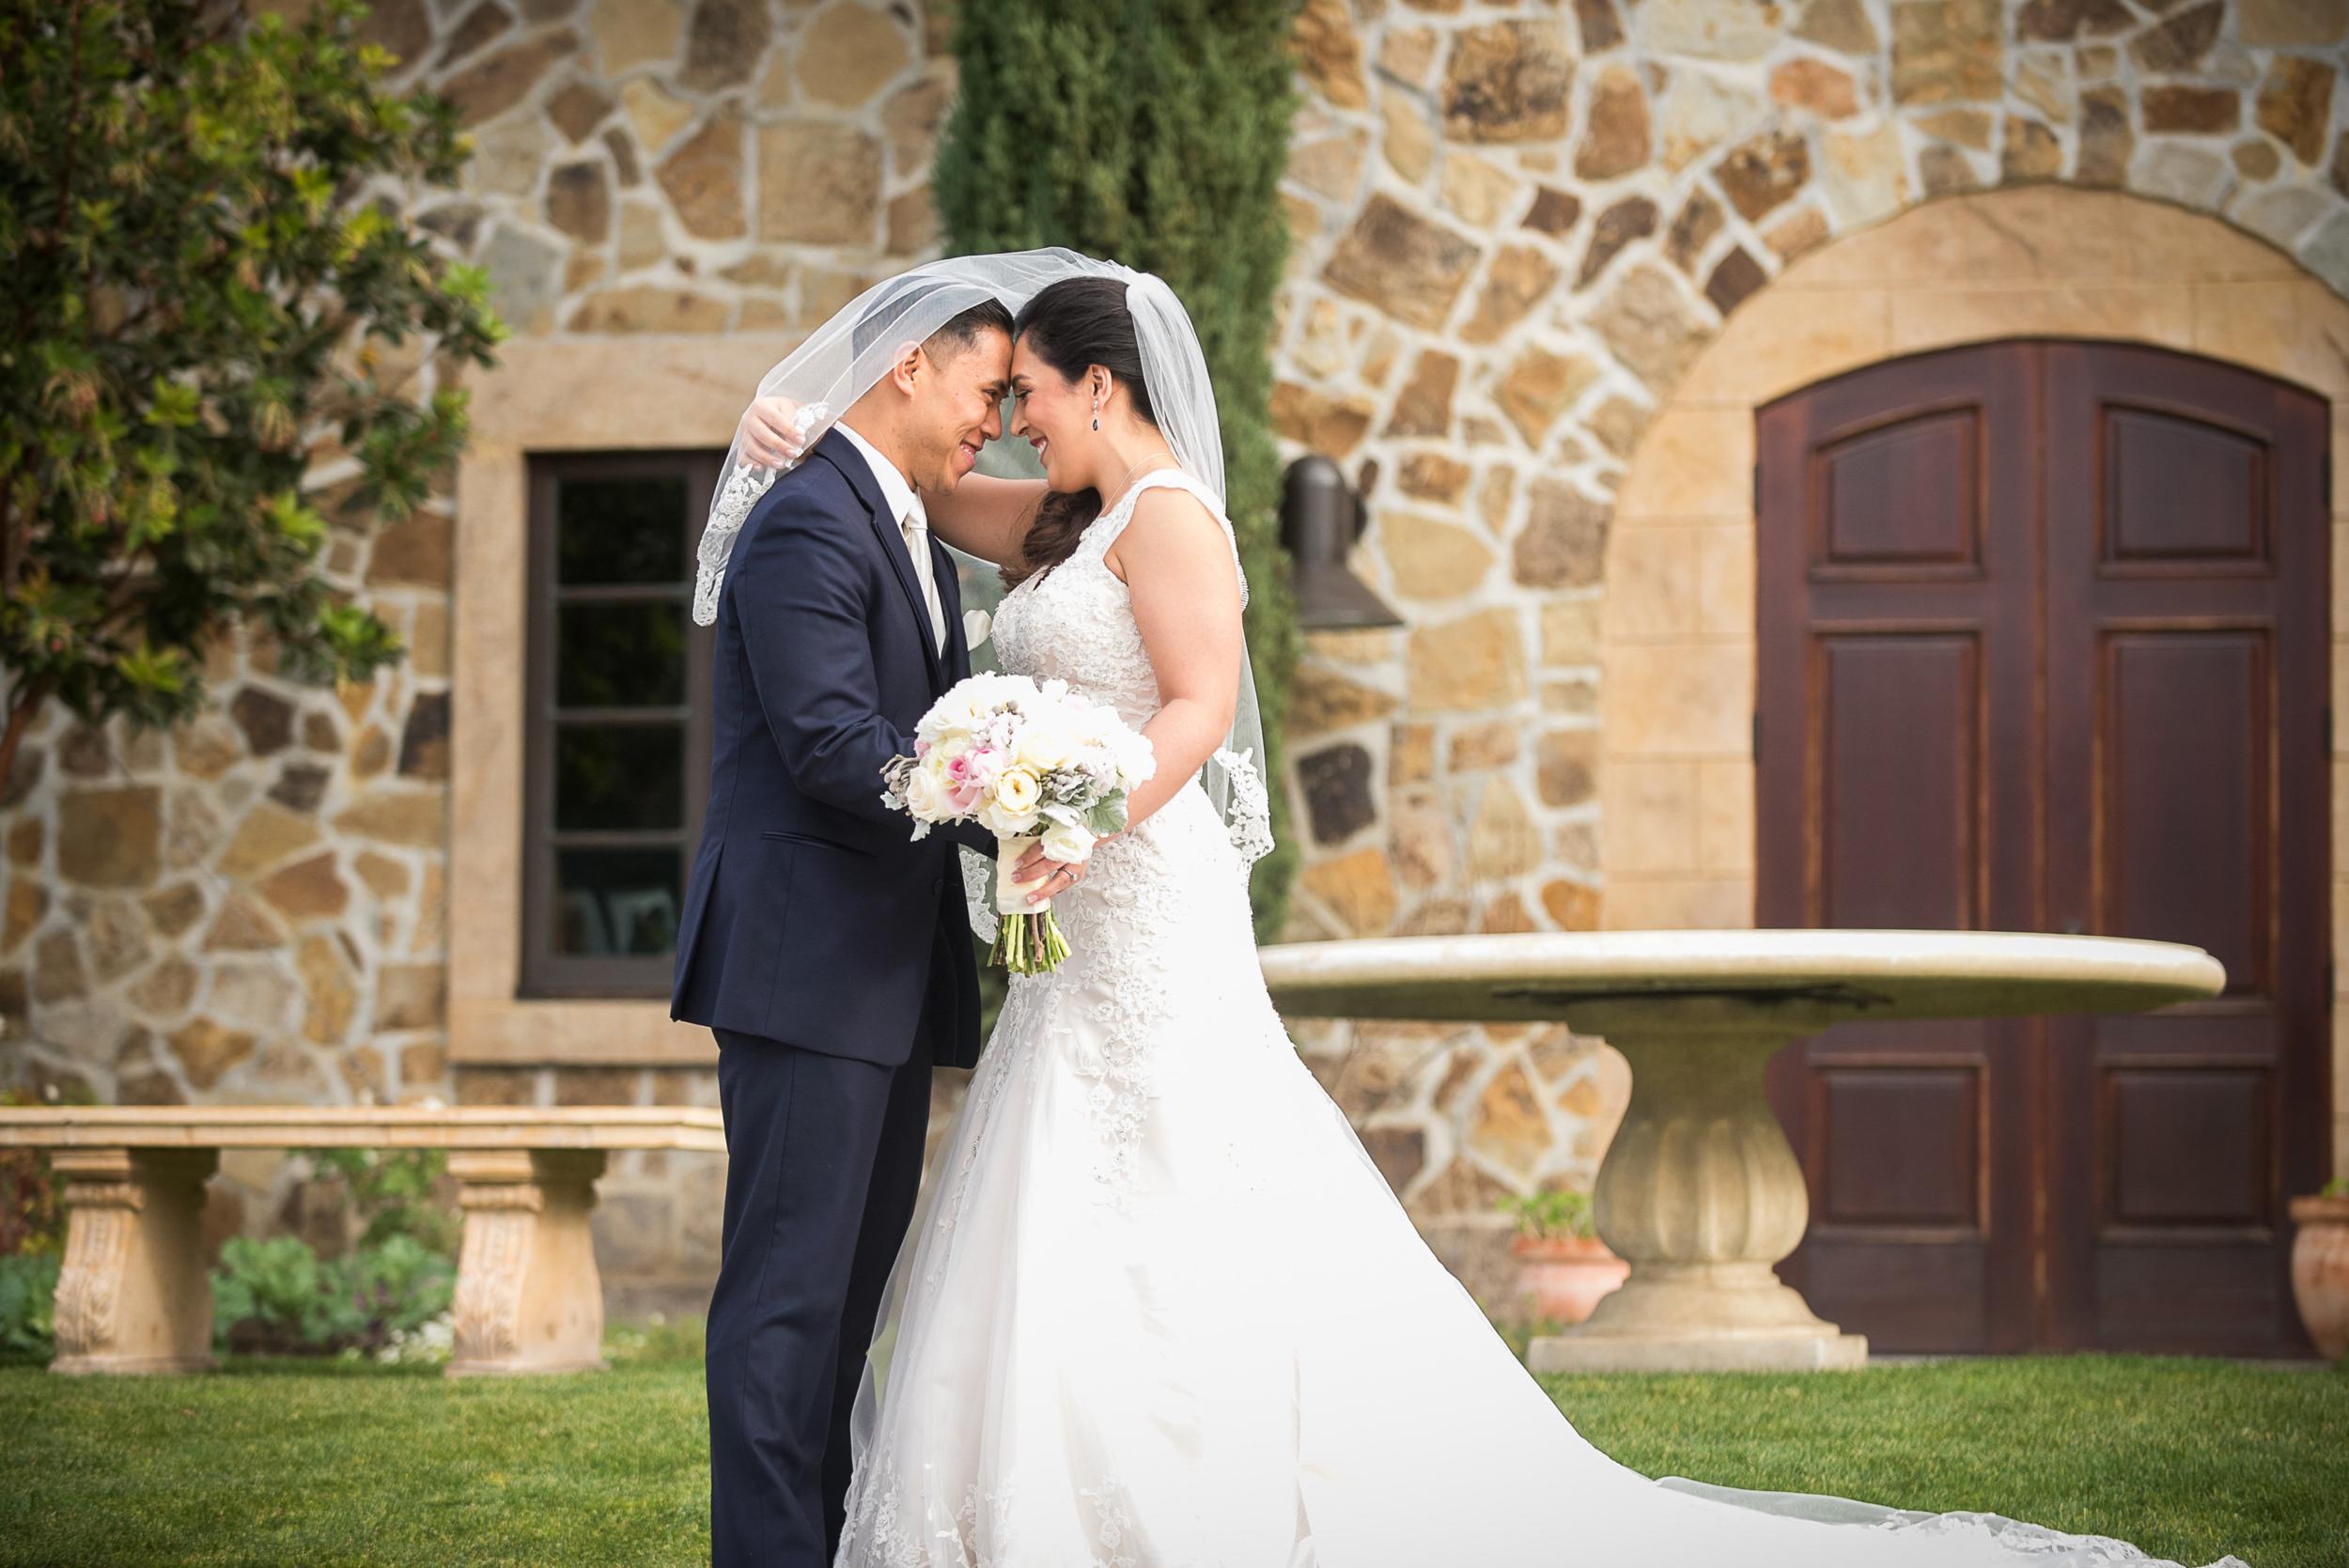 bernadus-lodge-wedding-carmel (2).jpg